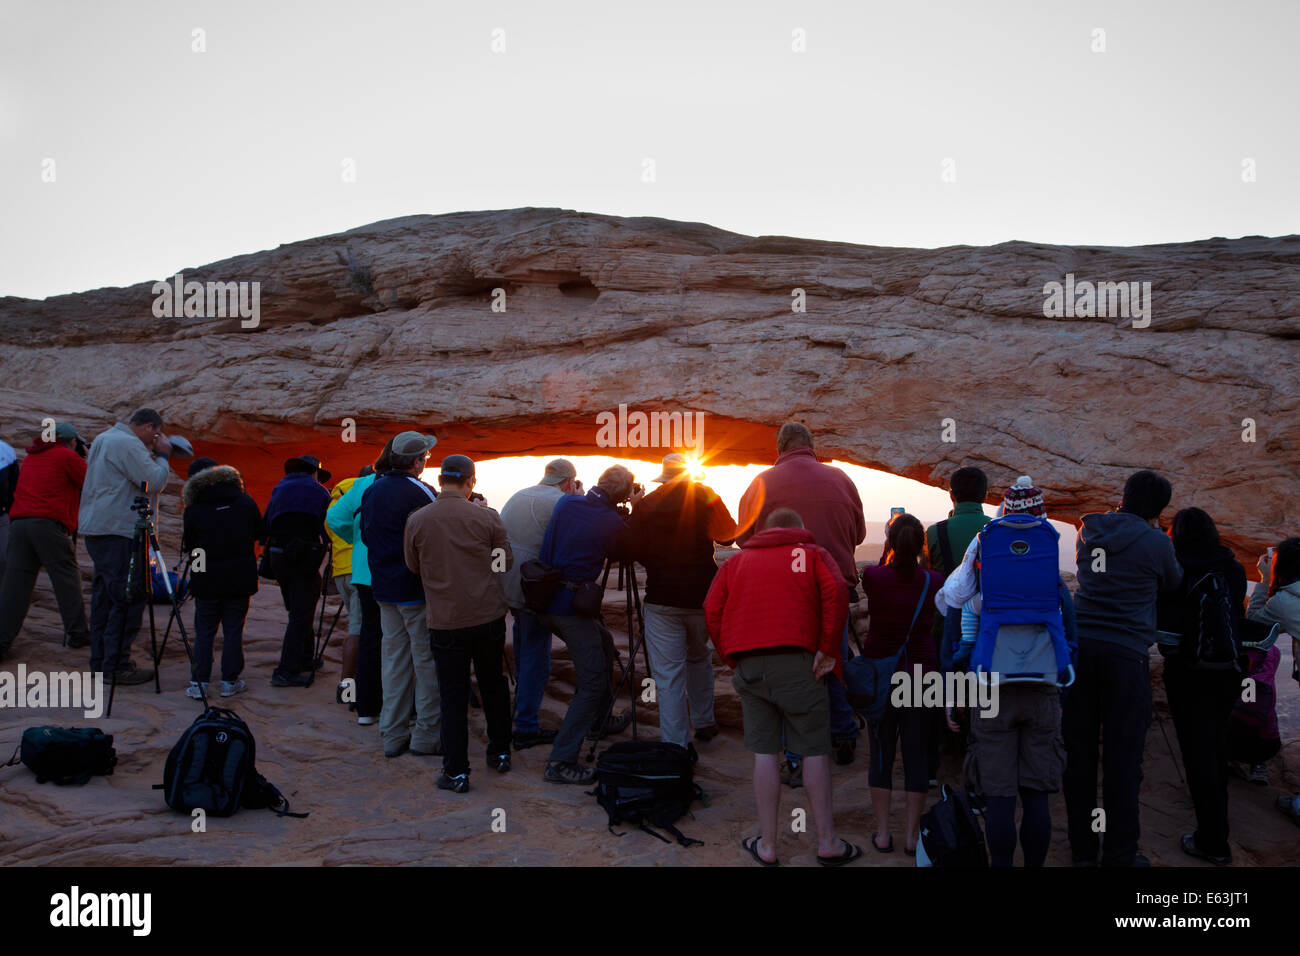 Crowd of photographers shooting sunrise under Mesa Arch, Canyonlands National Park, Utah, USA - Stock Image